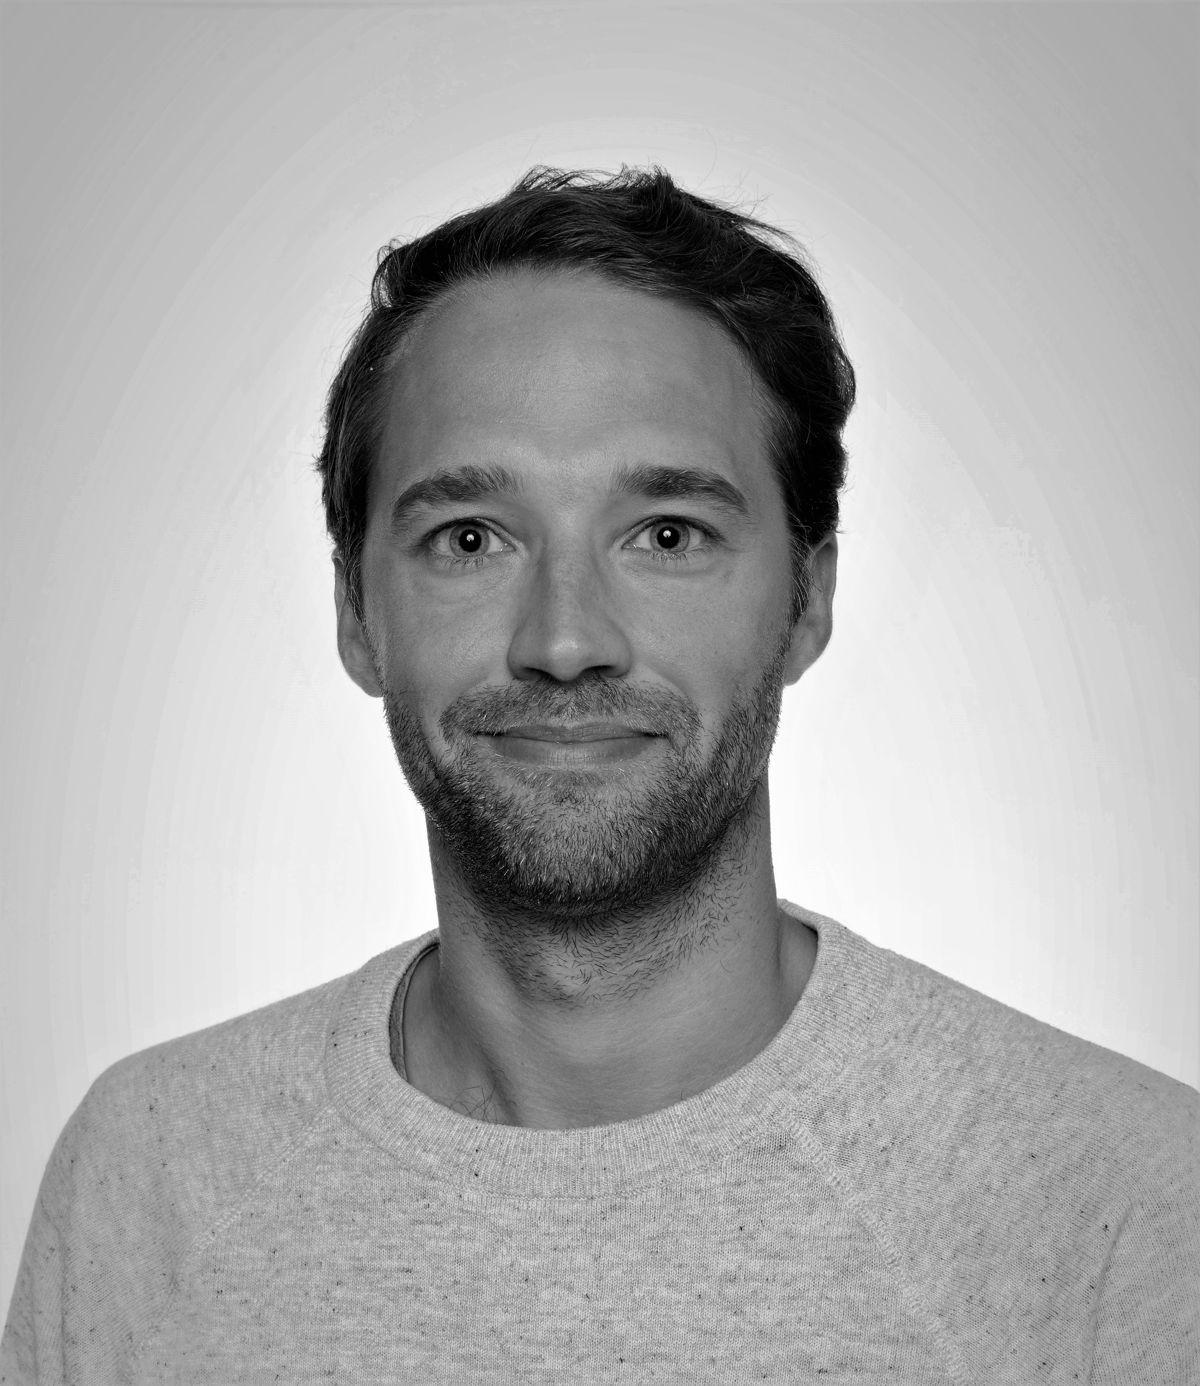 Mathias Fransen, founder and managing partner RoboRana